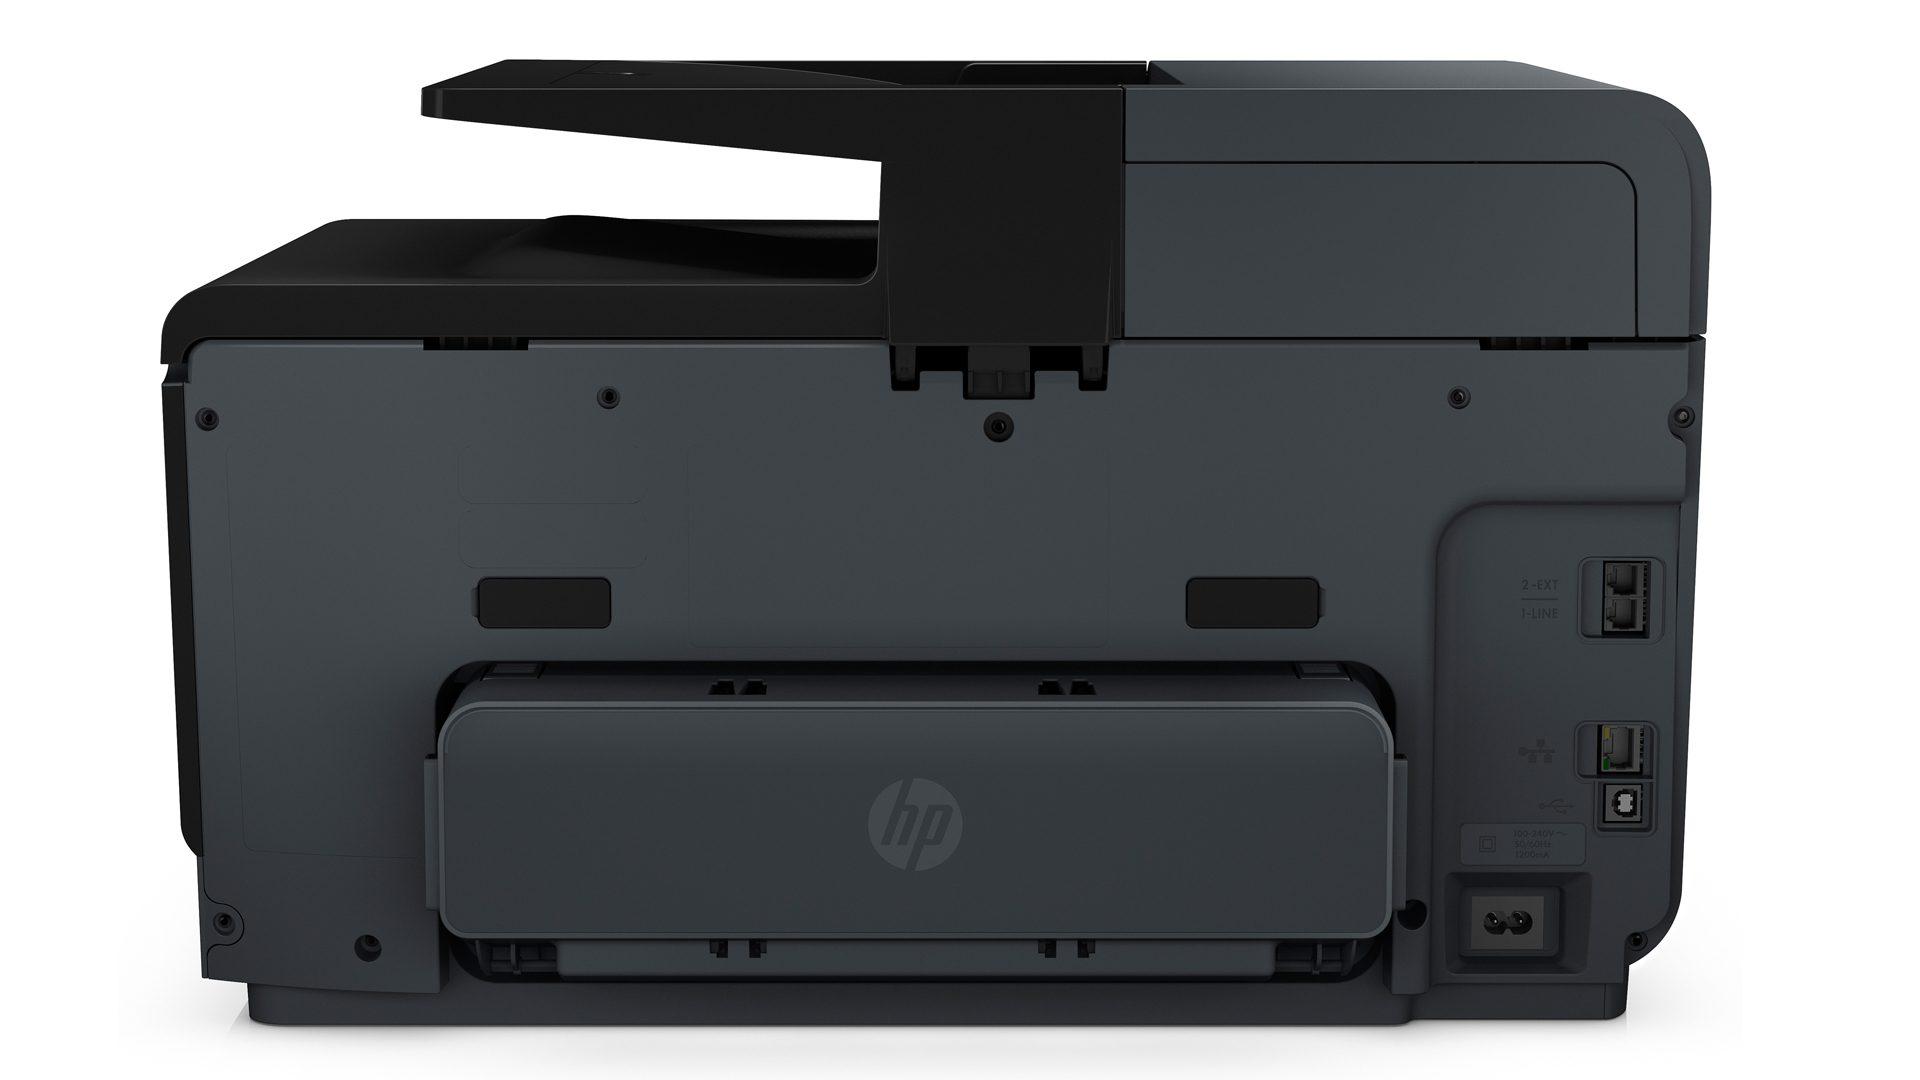 HP-Officejet-Pro-8620—Anischten-4